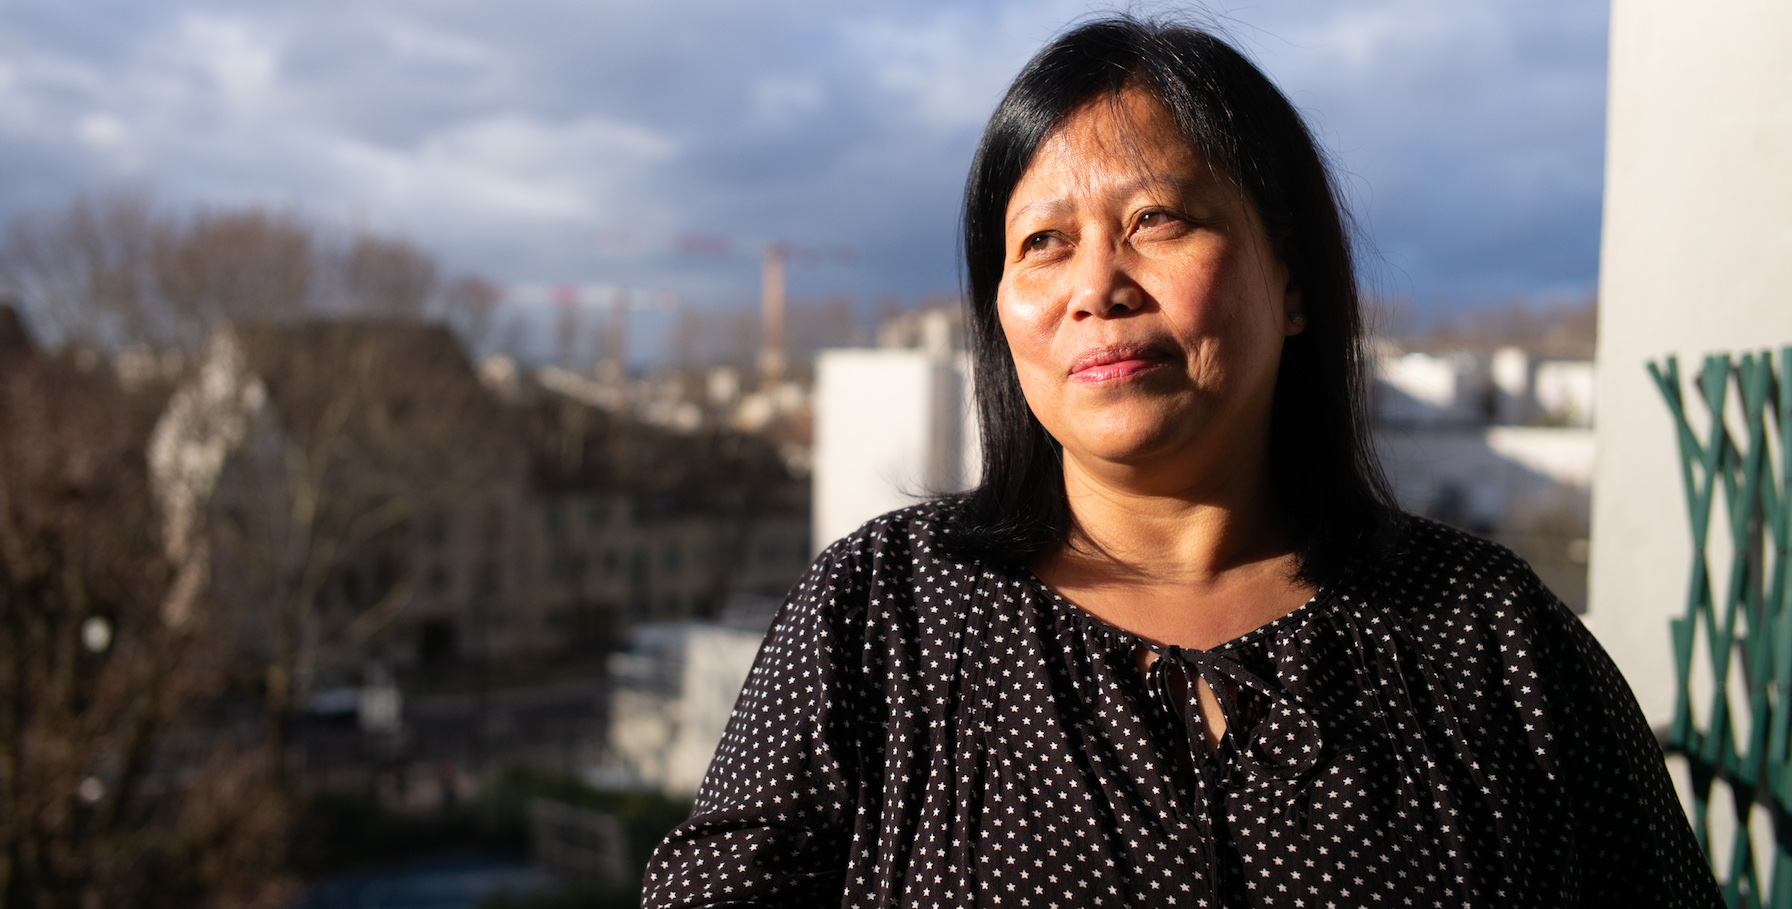 Zita Cabais-Obra, d'esclave domestique à briseuse de chaînes